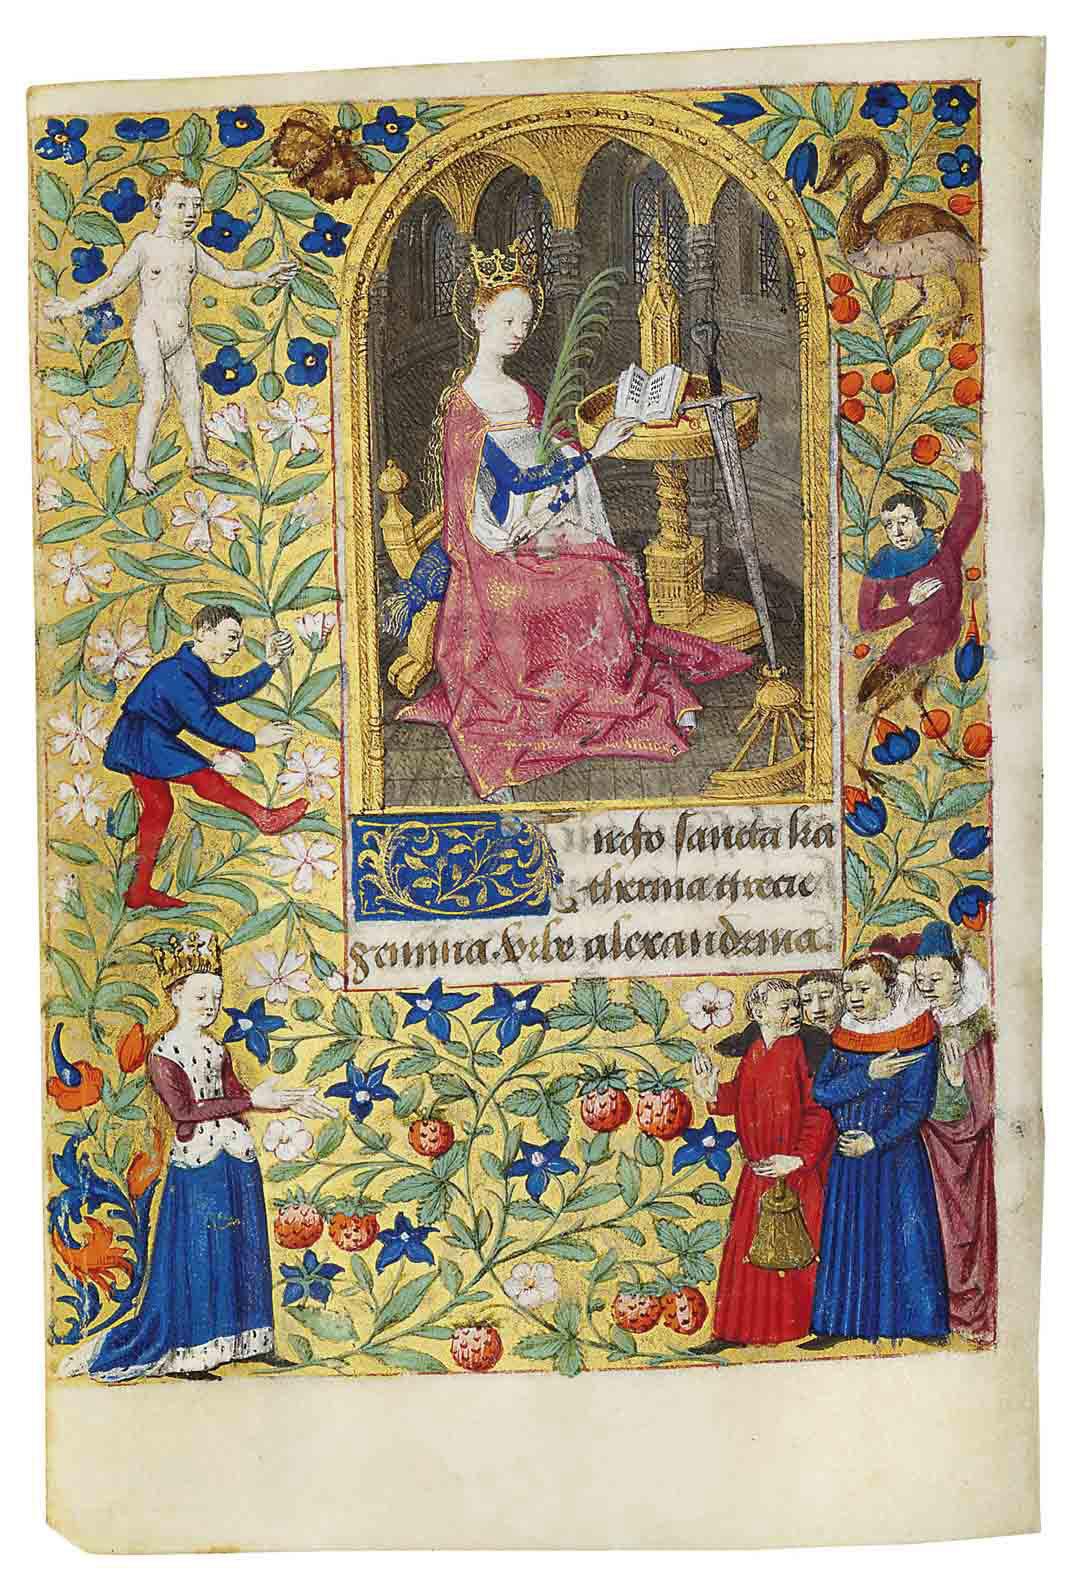 BOOK OF HOURS, use of Rome, in Latin, ILLUMINATED MANUSCRIPT ON VELLUM